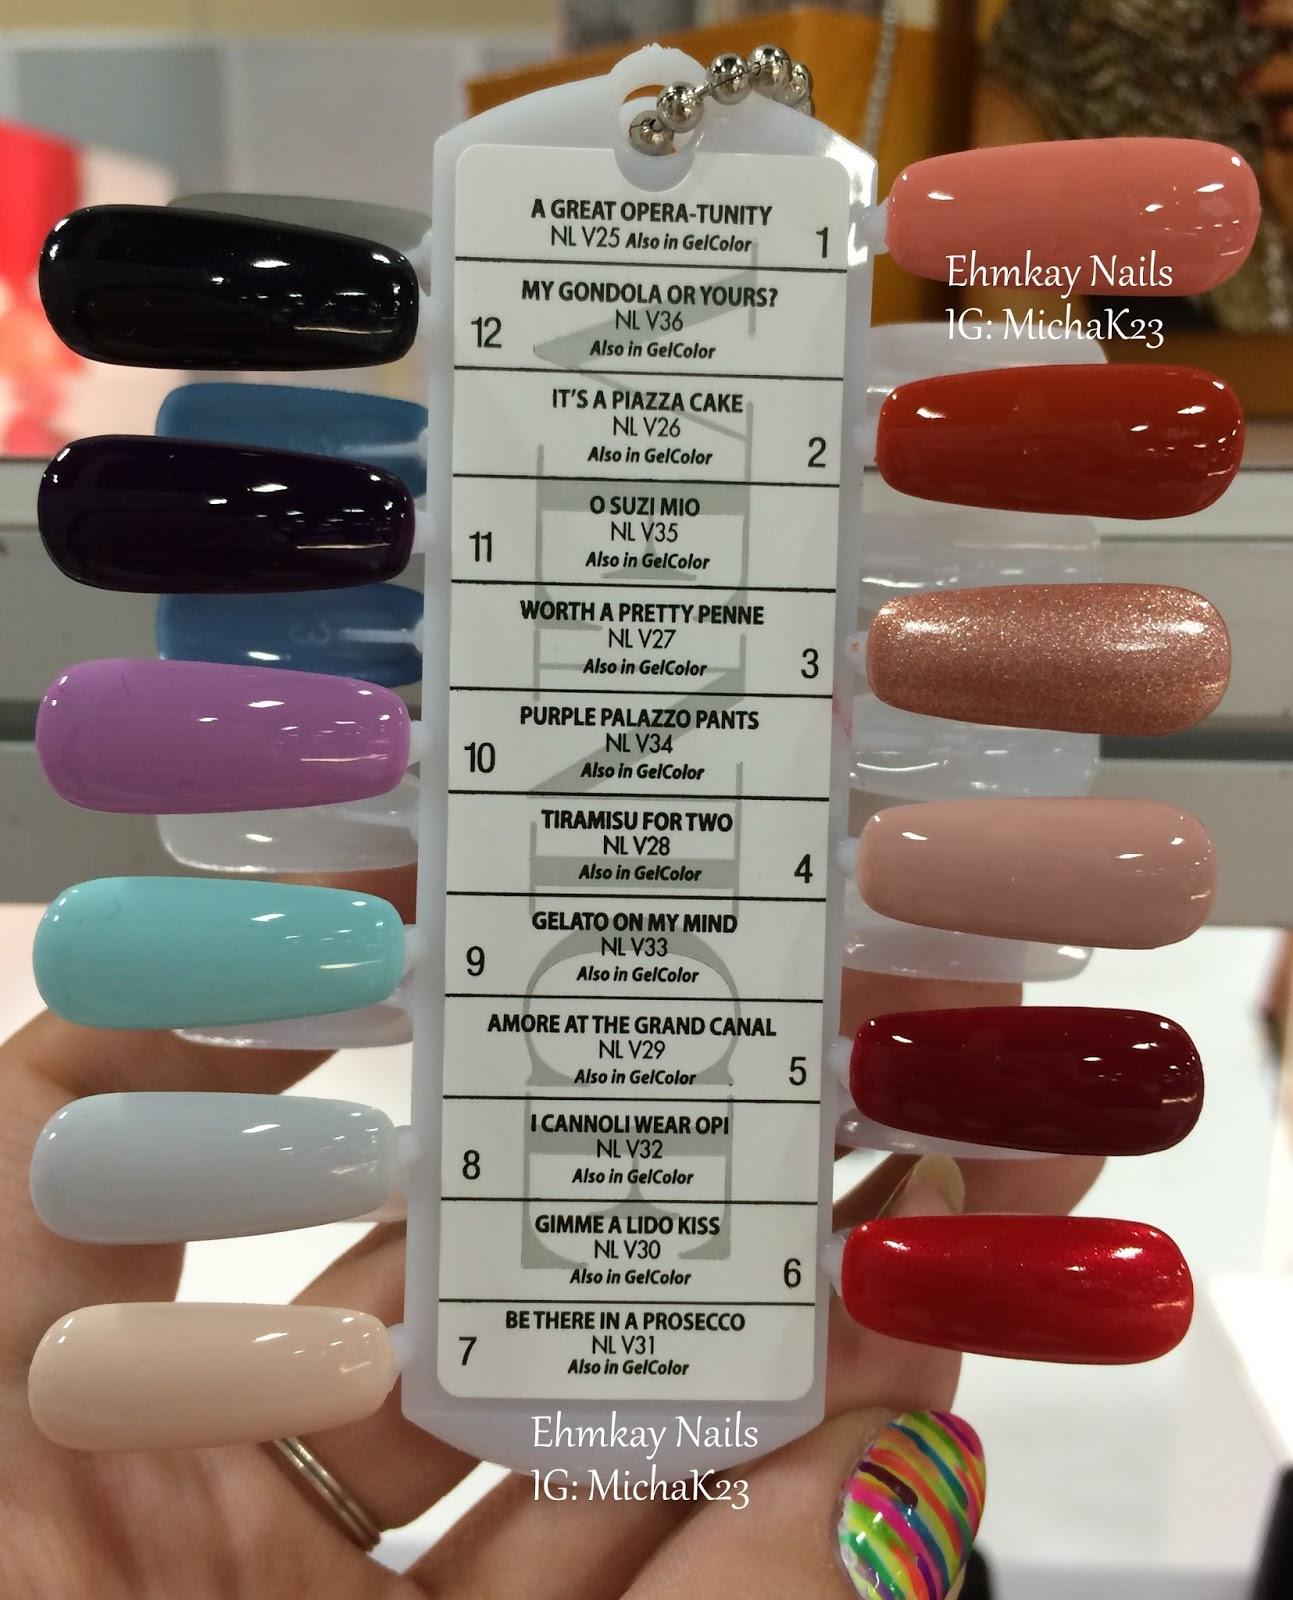 ehmkay nails: Cosmoprof NA 2015 Recap 1: Jessica Cosmetics, Color ...